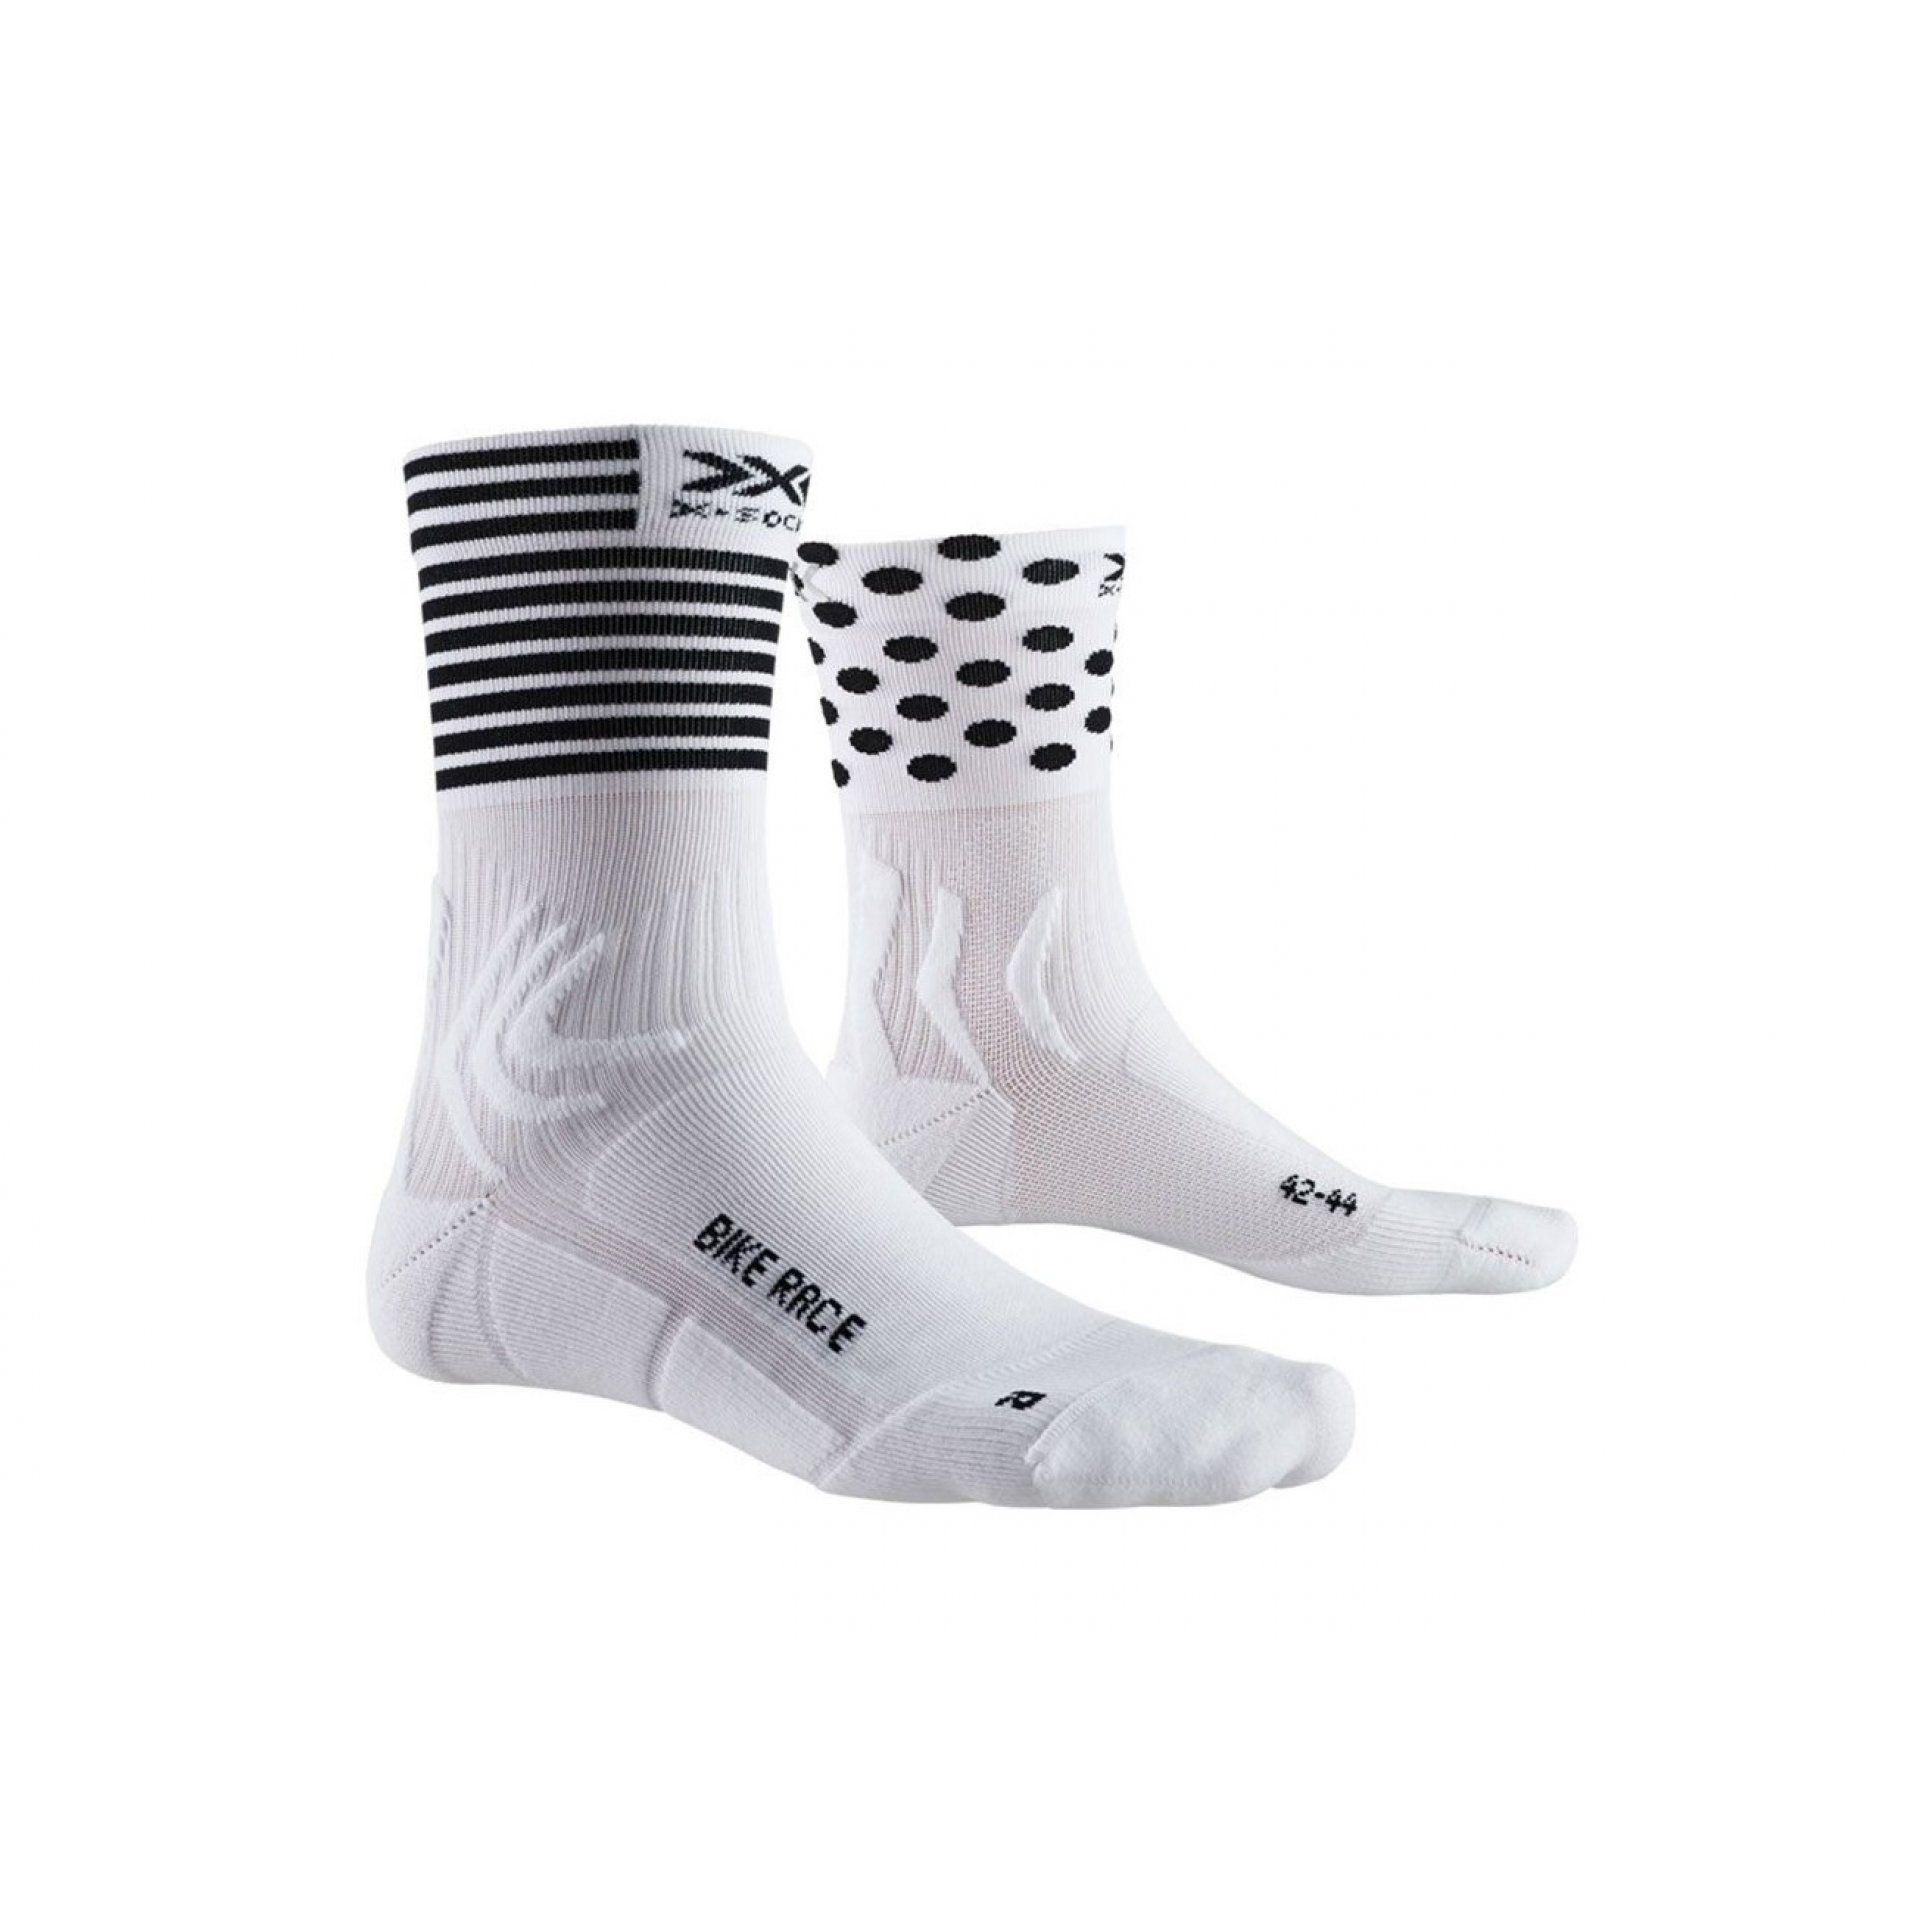 SKARPETY ROWEROWE X-SOCKS BIKE RACE W011